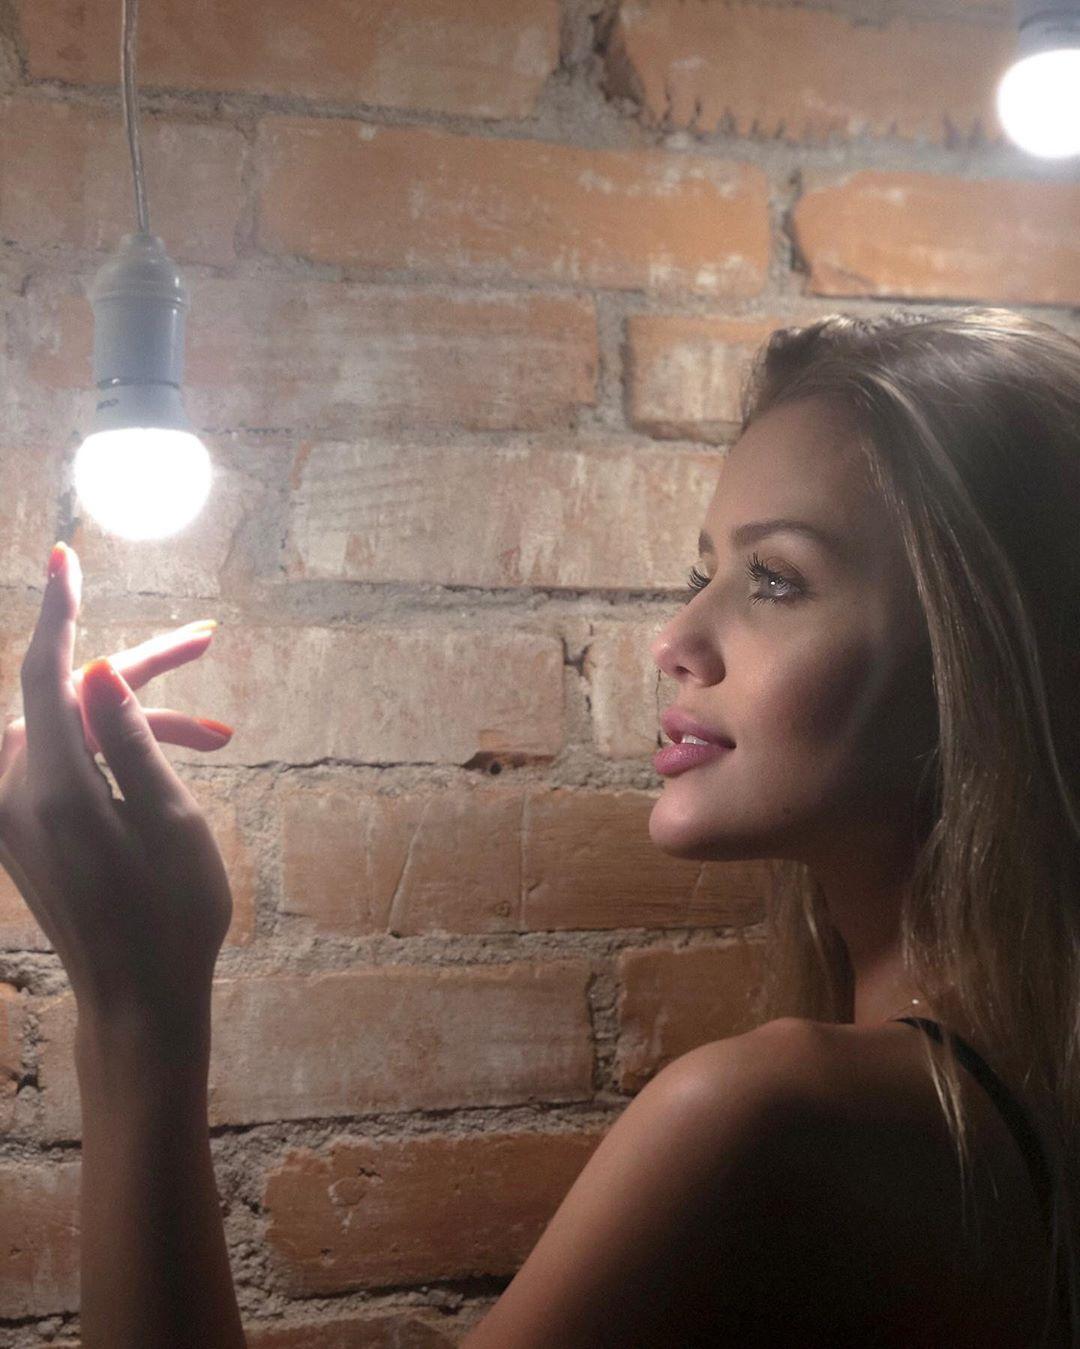 marcella kozinski de barros, miss curitiba 2020/3rd runner-up de miss tourism world 2019. - Página 2 62362810